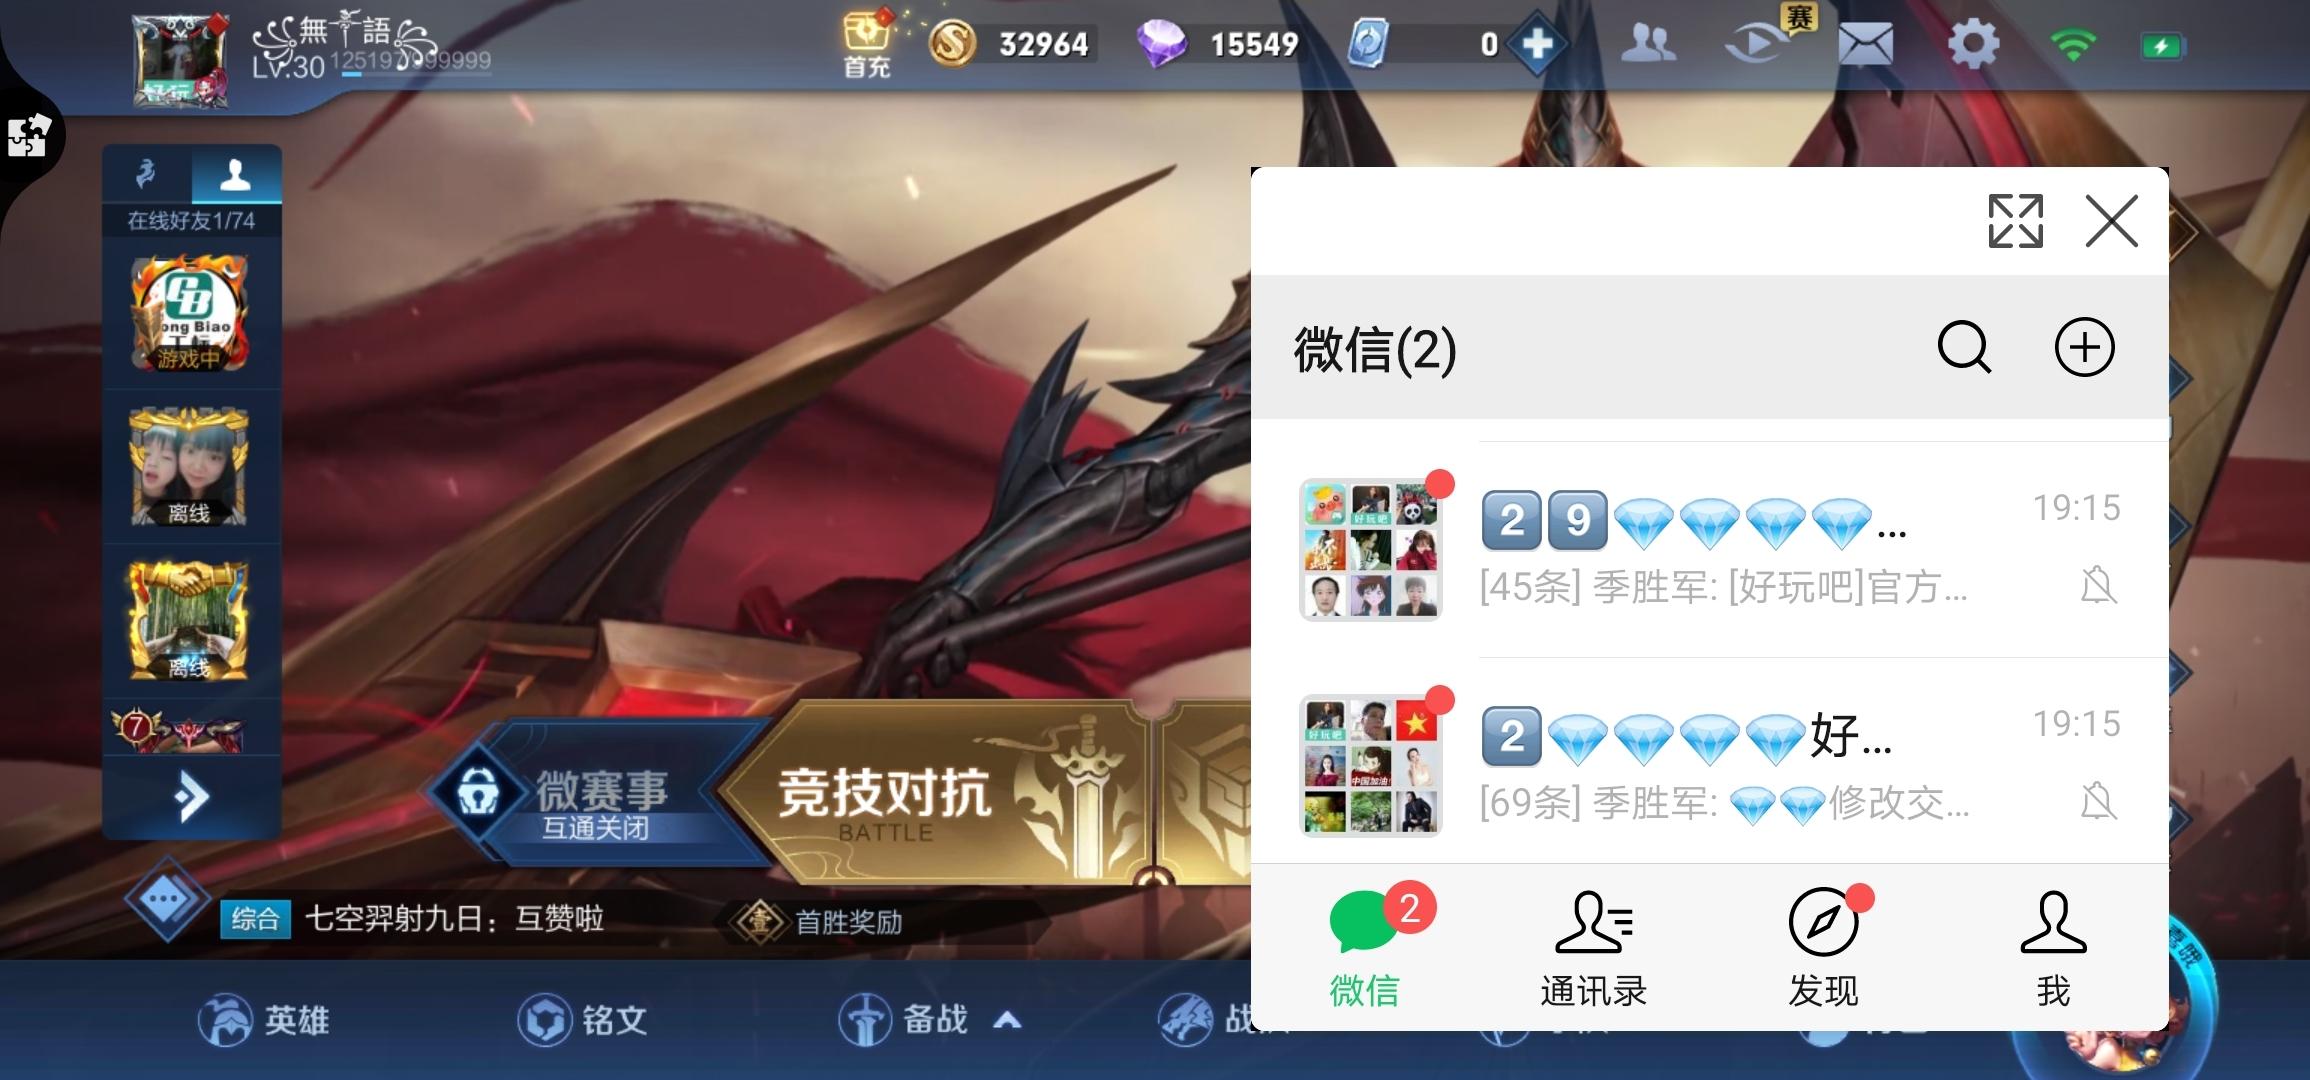 Screenshot_20200707_191740_com.tencent.tmgp.sgame.jpg